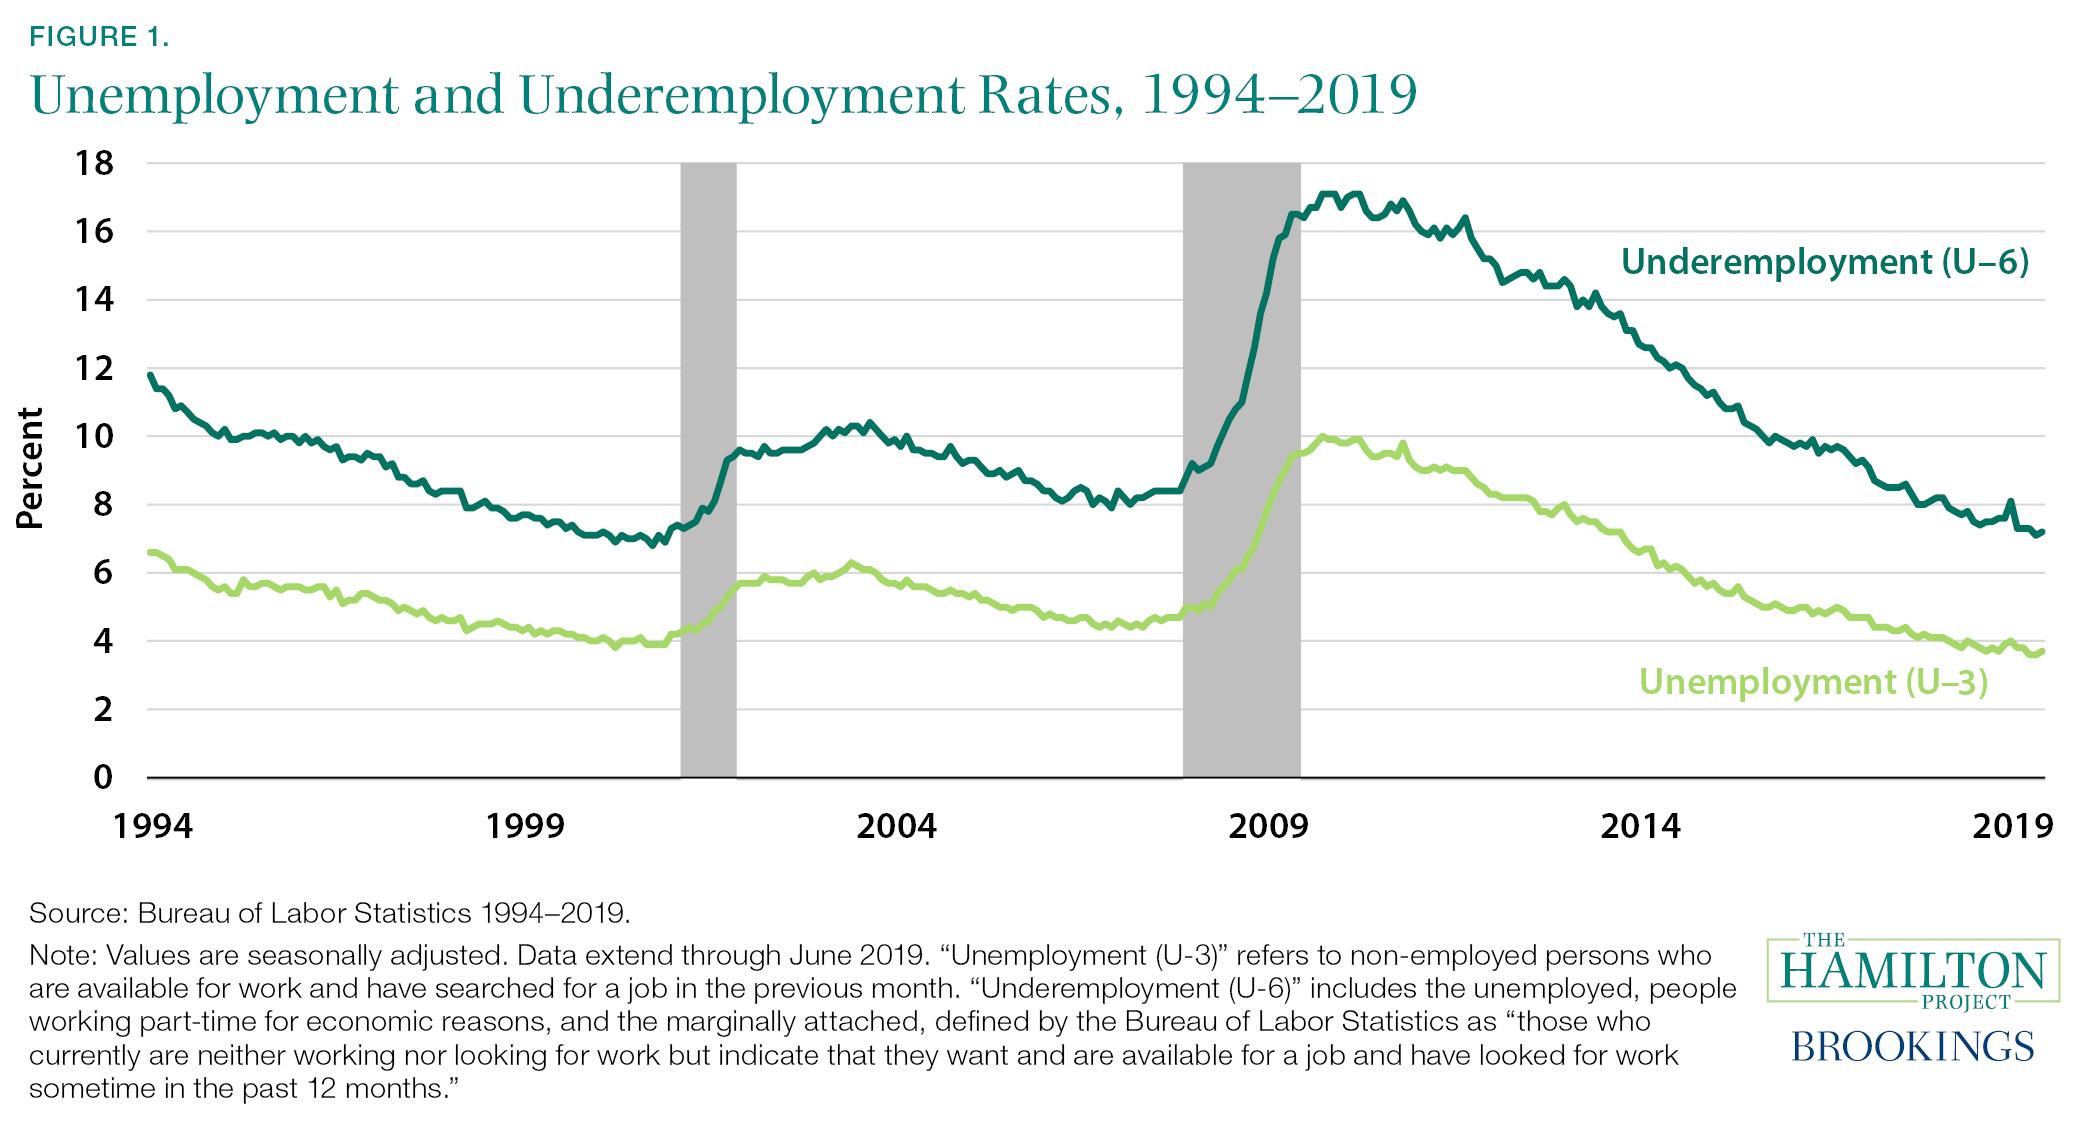 Underemployment Rates